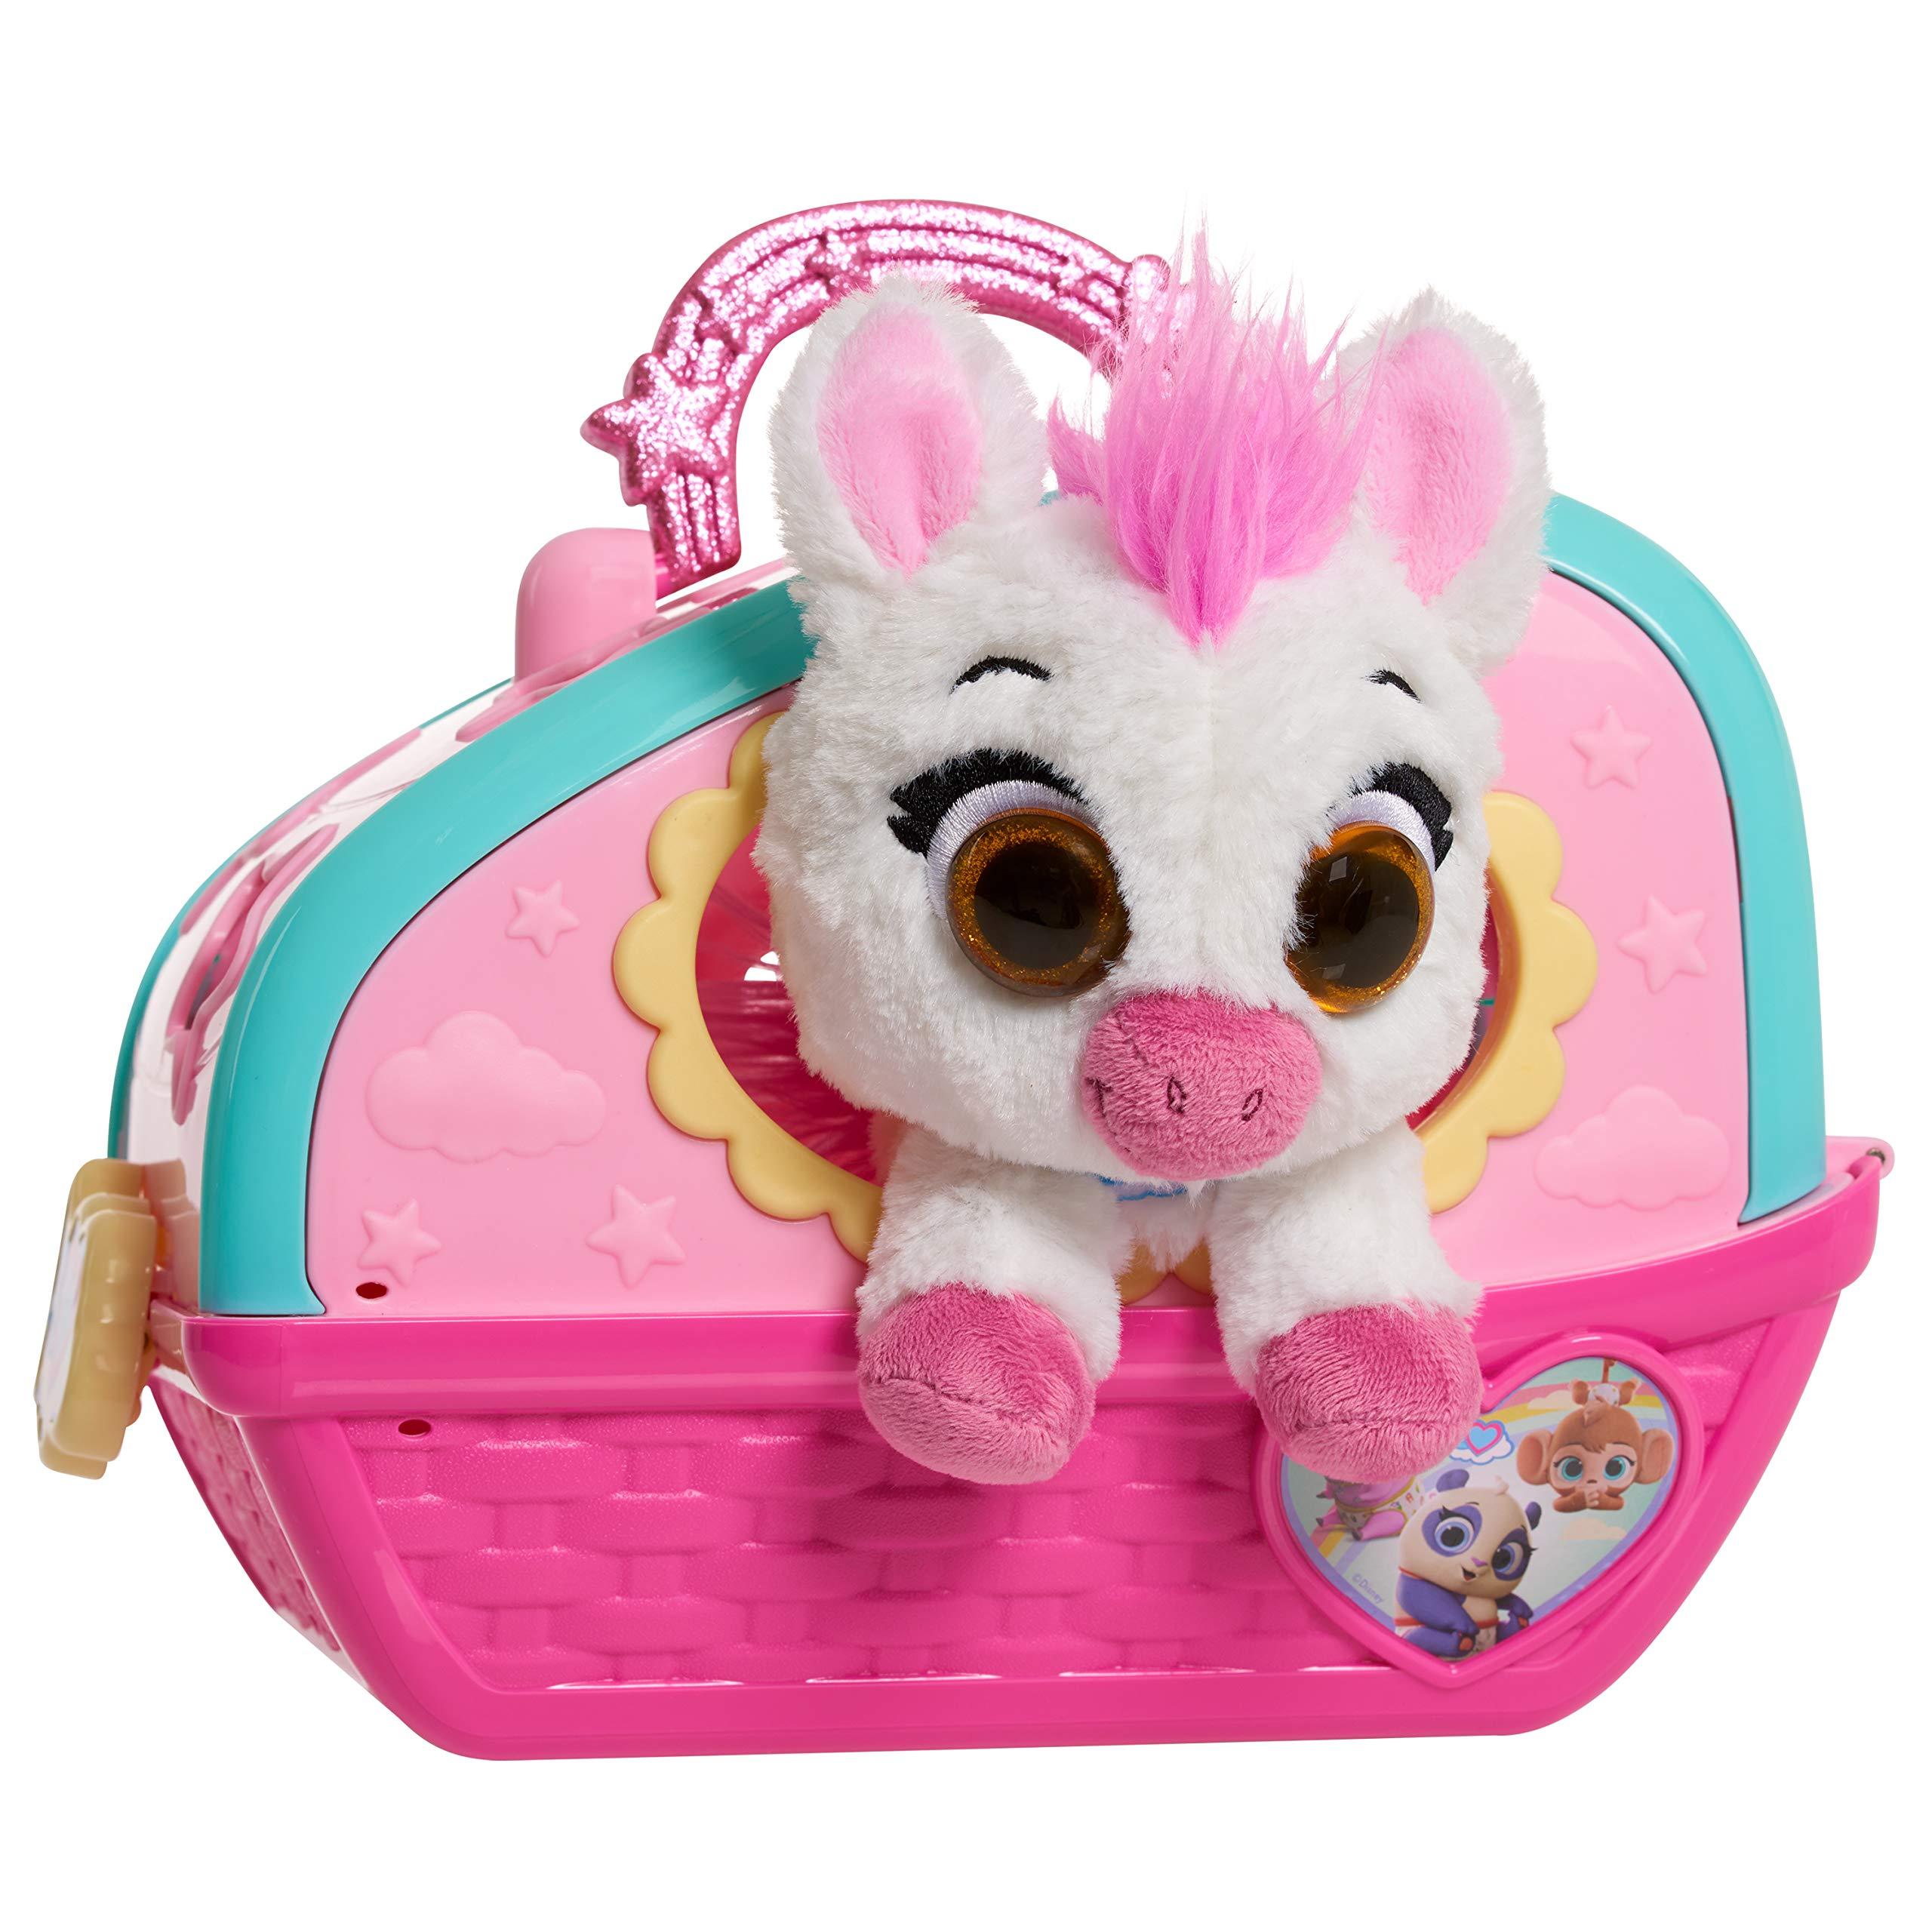 Disney Jr T.O.T.S. Care for Me Pet Carrier - Pony by Disney Jr T.O.T.S.